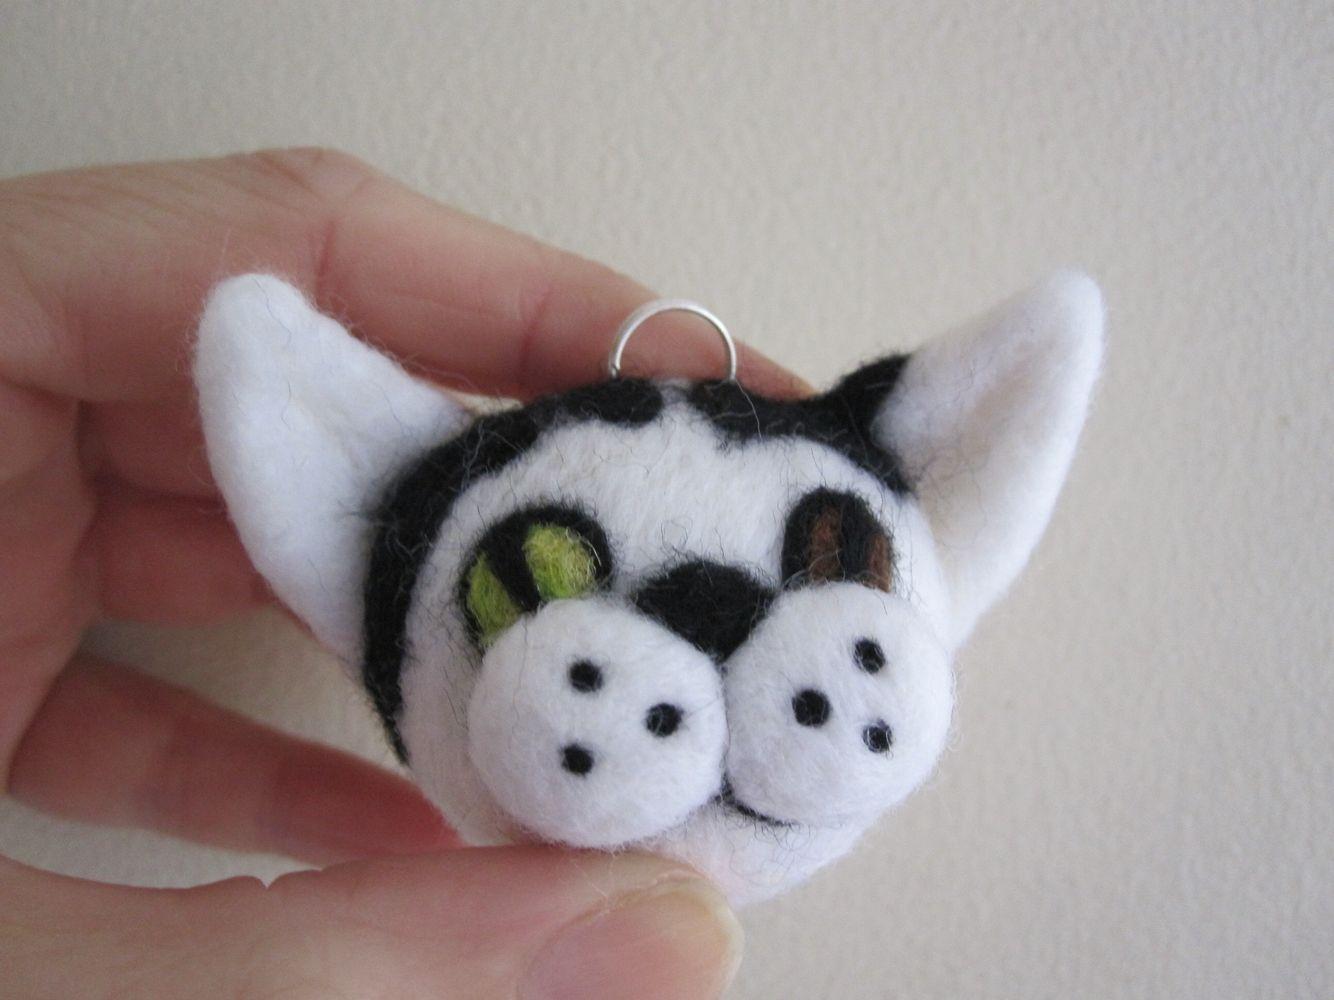 Needlefelted custom stupidcats bag charm, based on the customer's real-life cat. 2010-2012